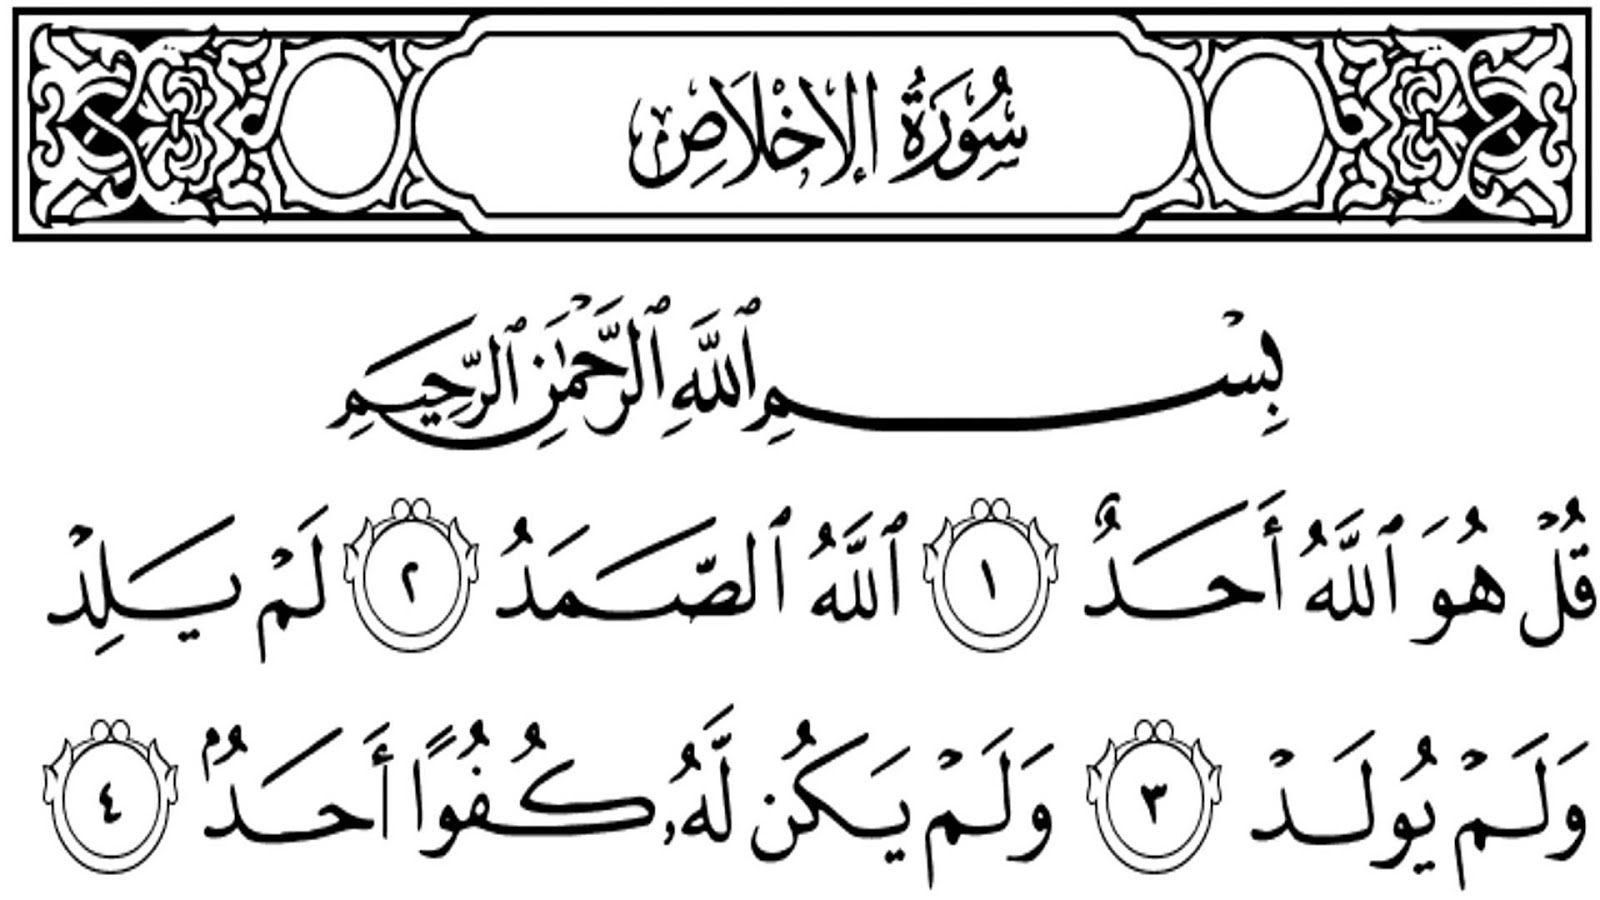 9 Waktu Membaca Surah Al Ikhlas (มีรูปภาพ)